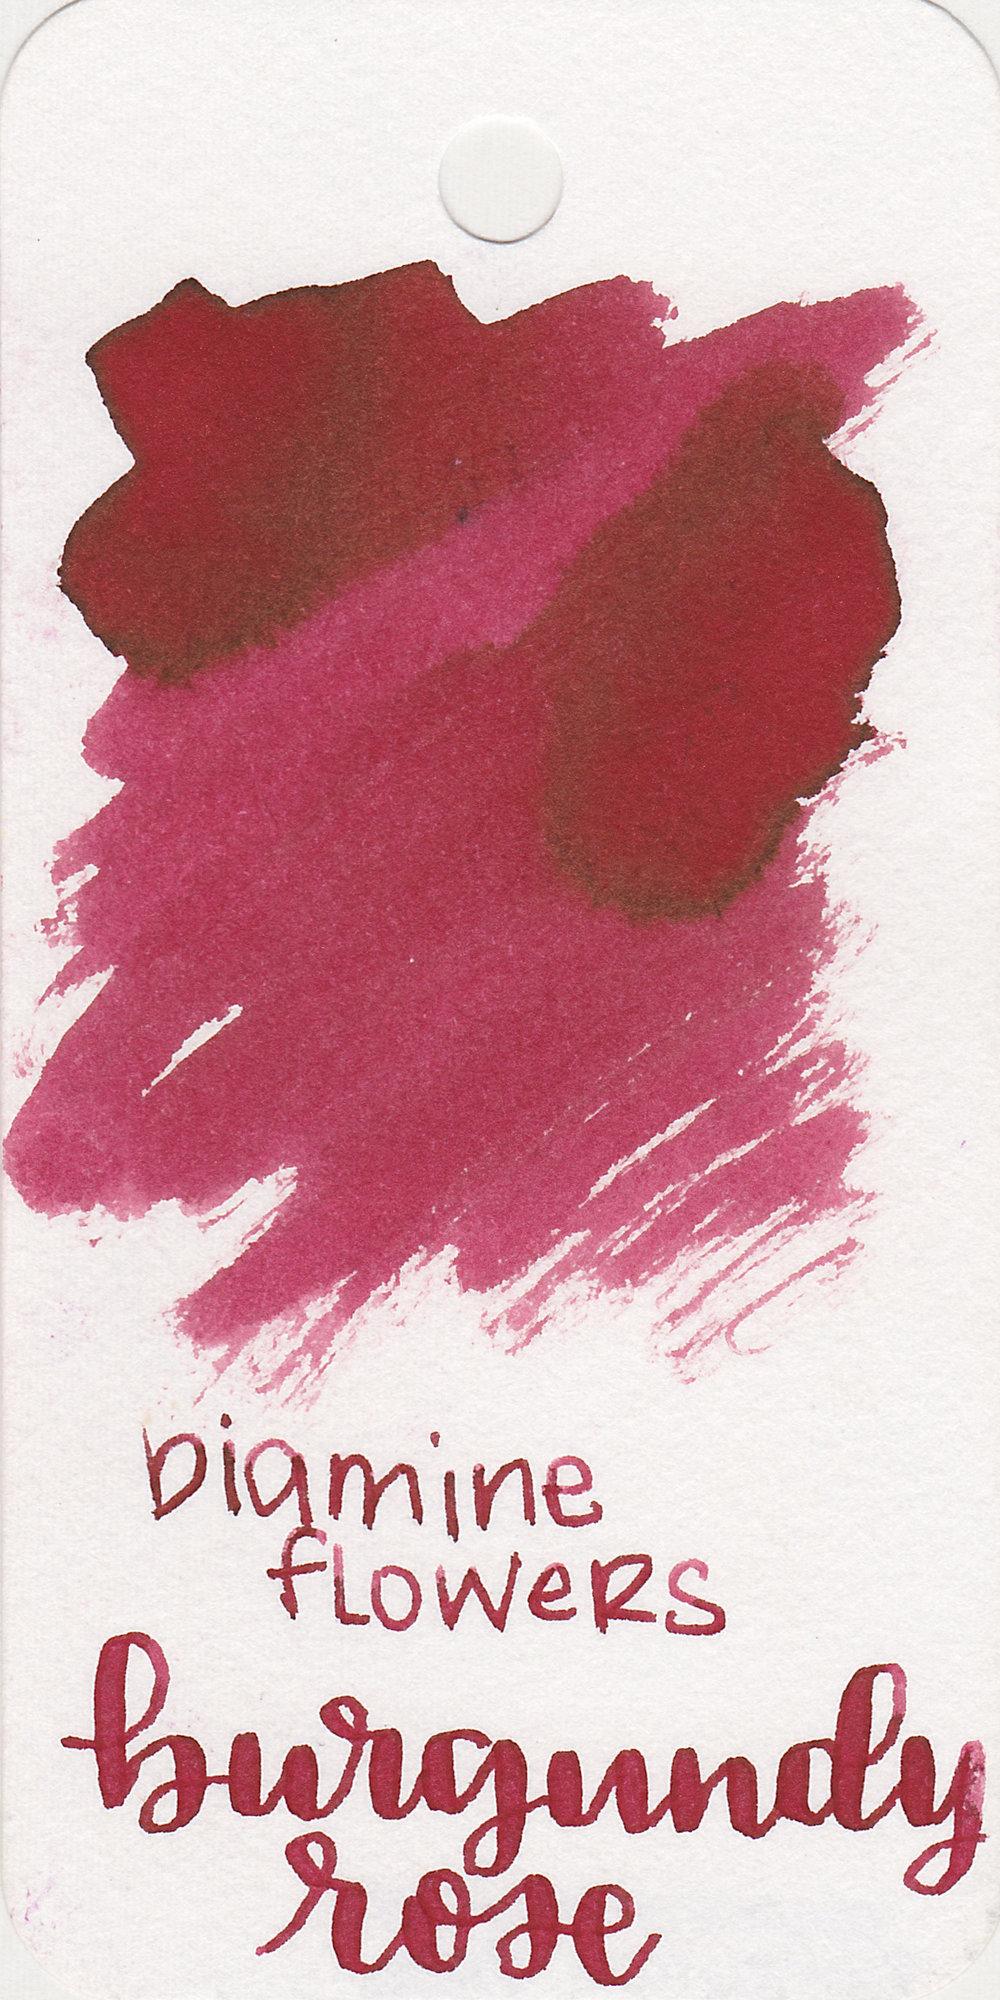 d-burgundy-rose-1.jpg